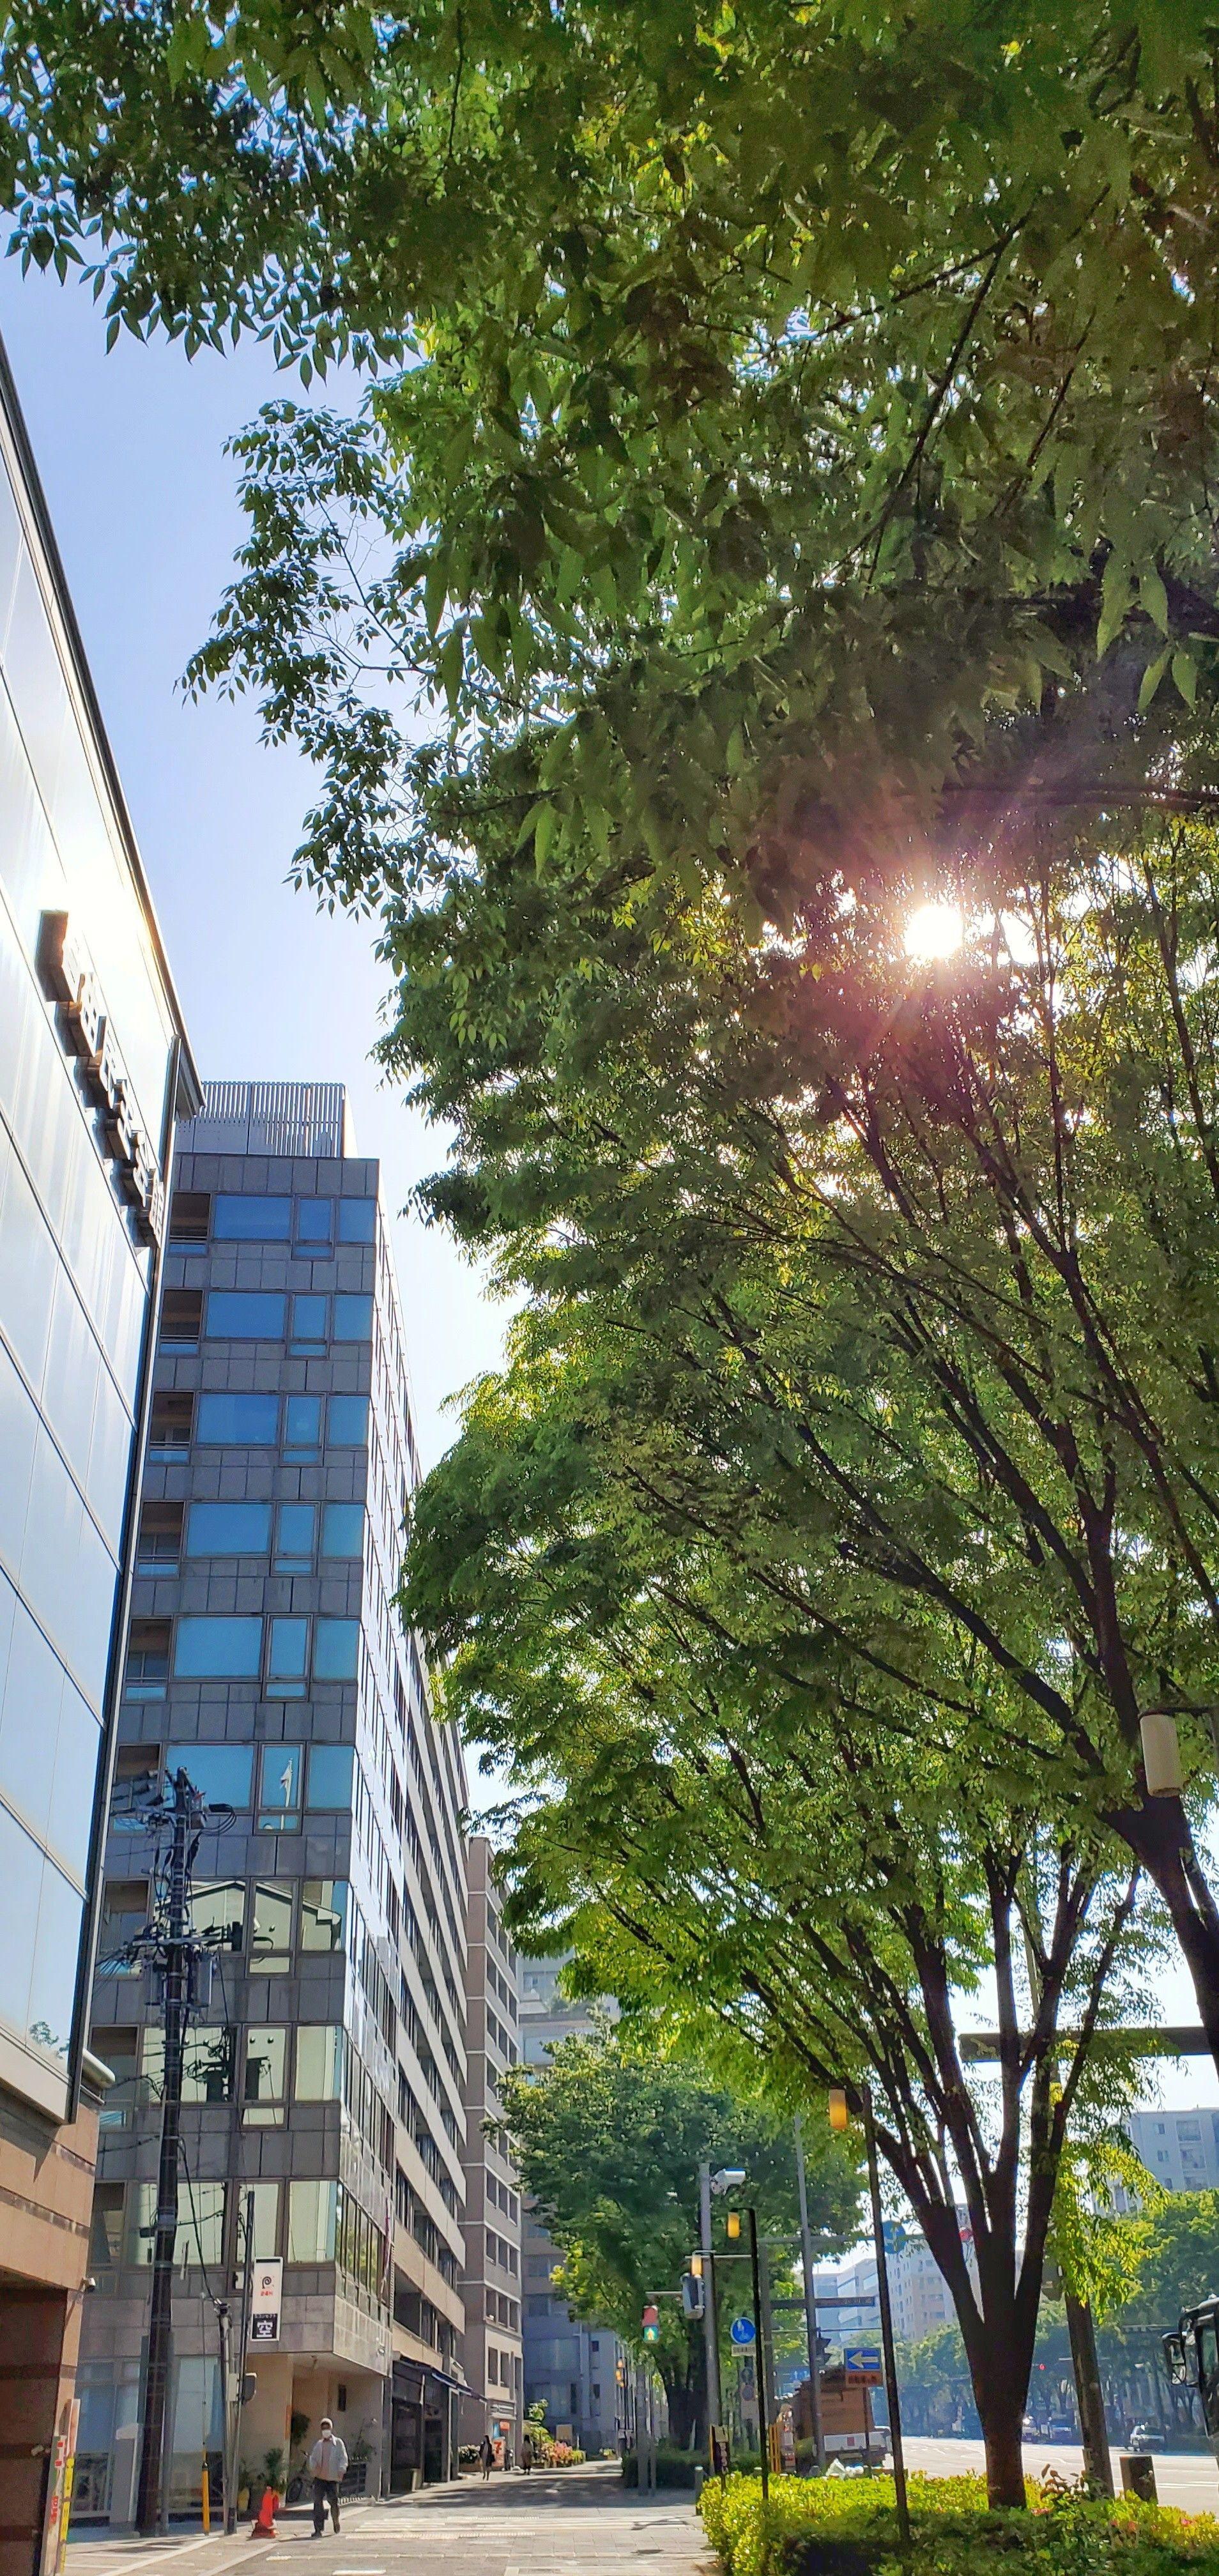 f:id:Atsuzo-SUN:20210421215406j:image